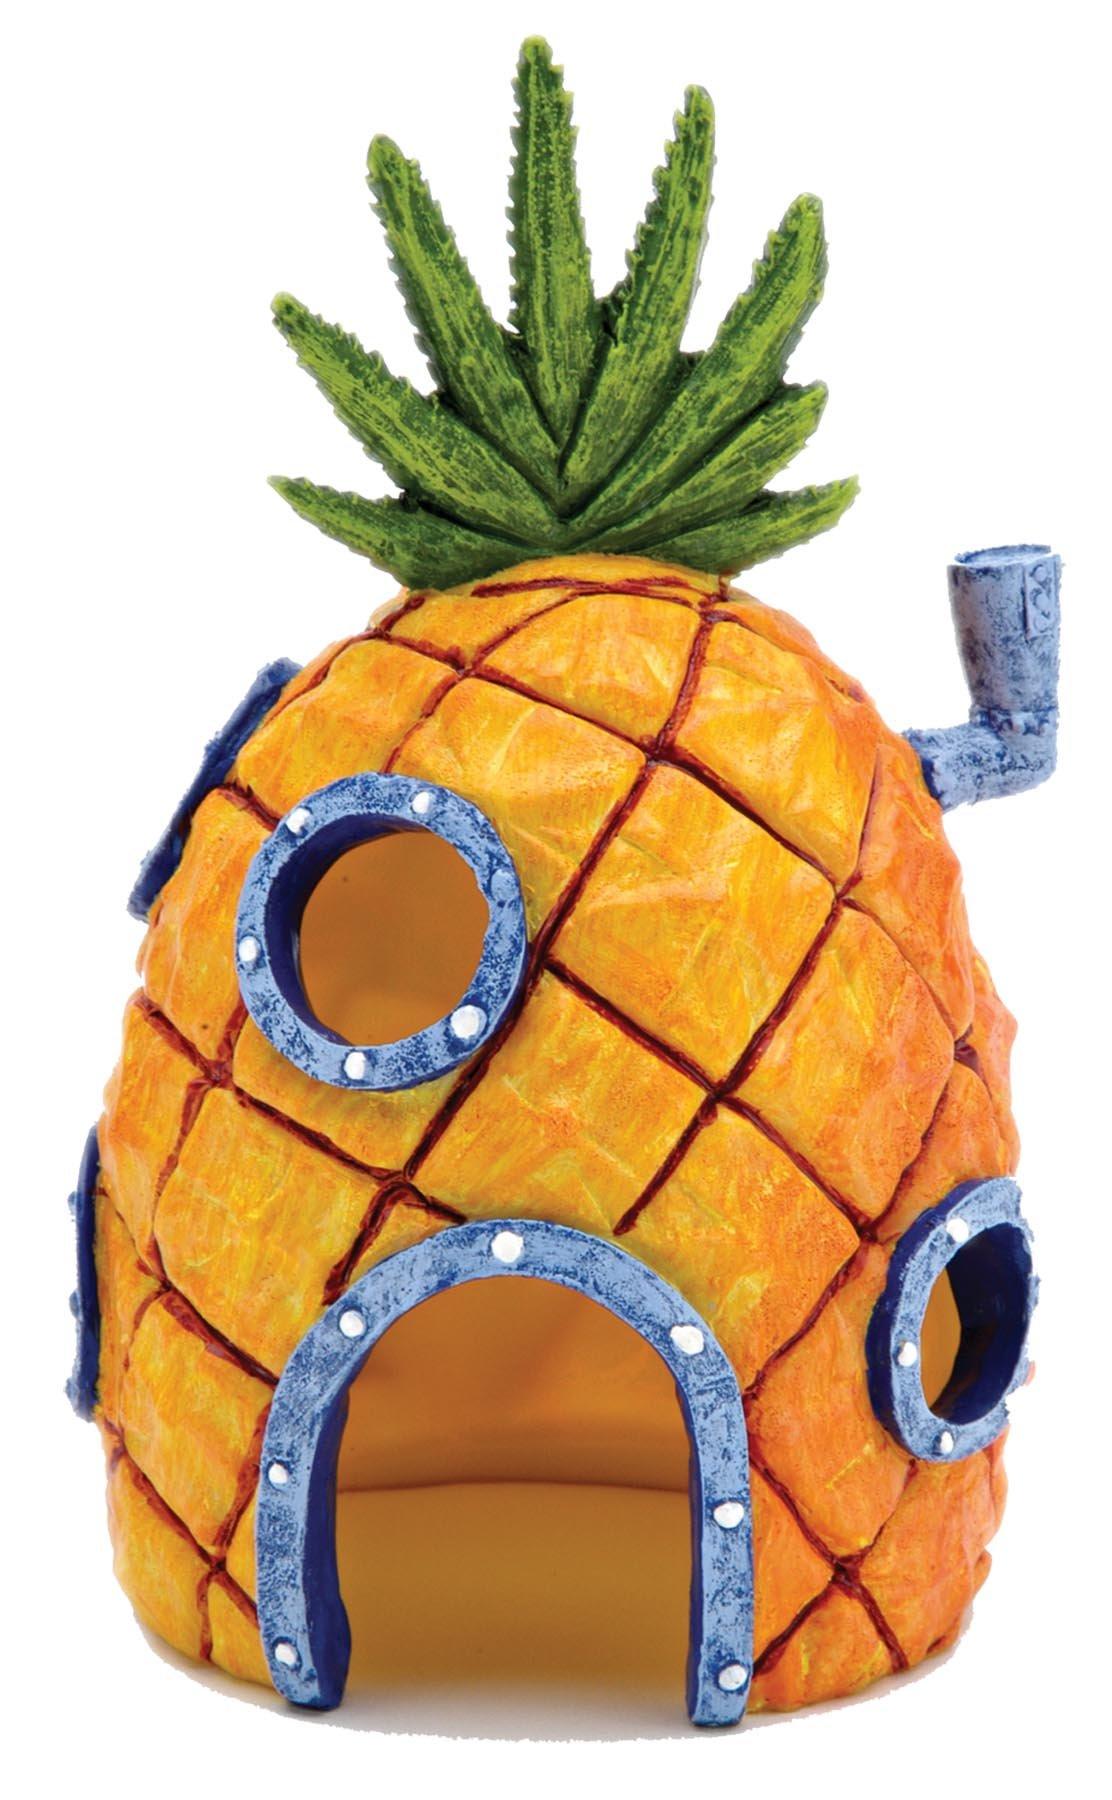 Penn Plax Dekofigur Spongebob Ananas Haus